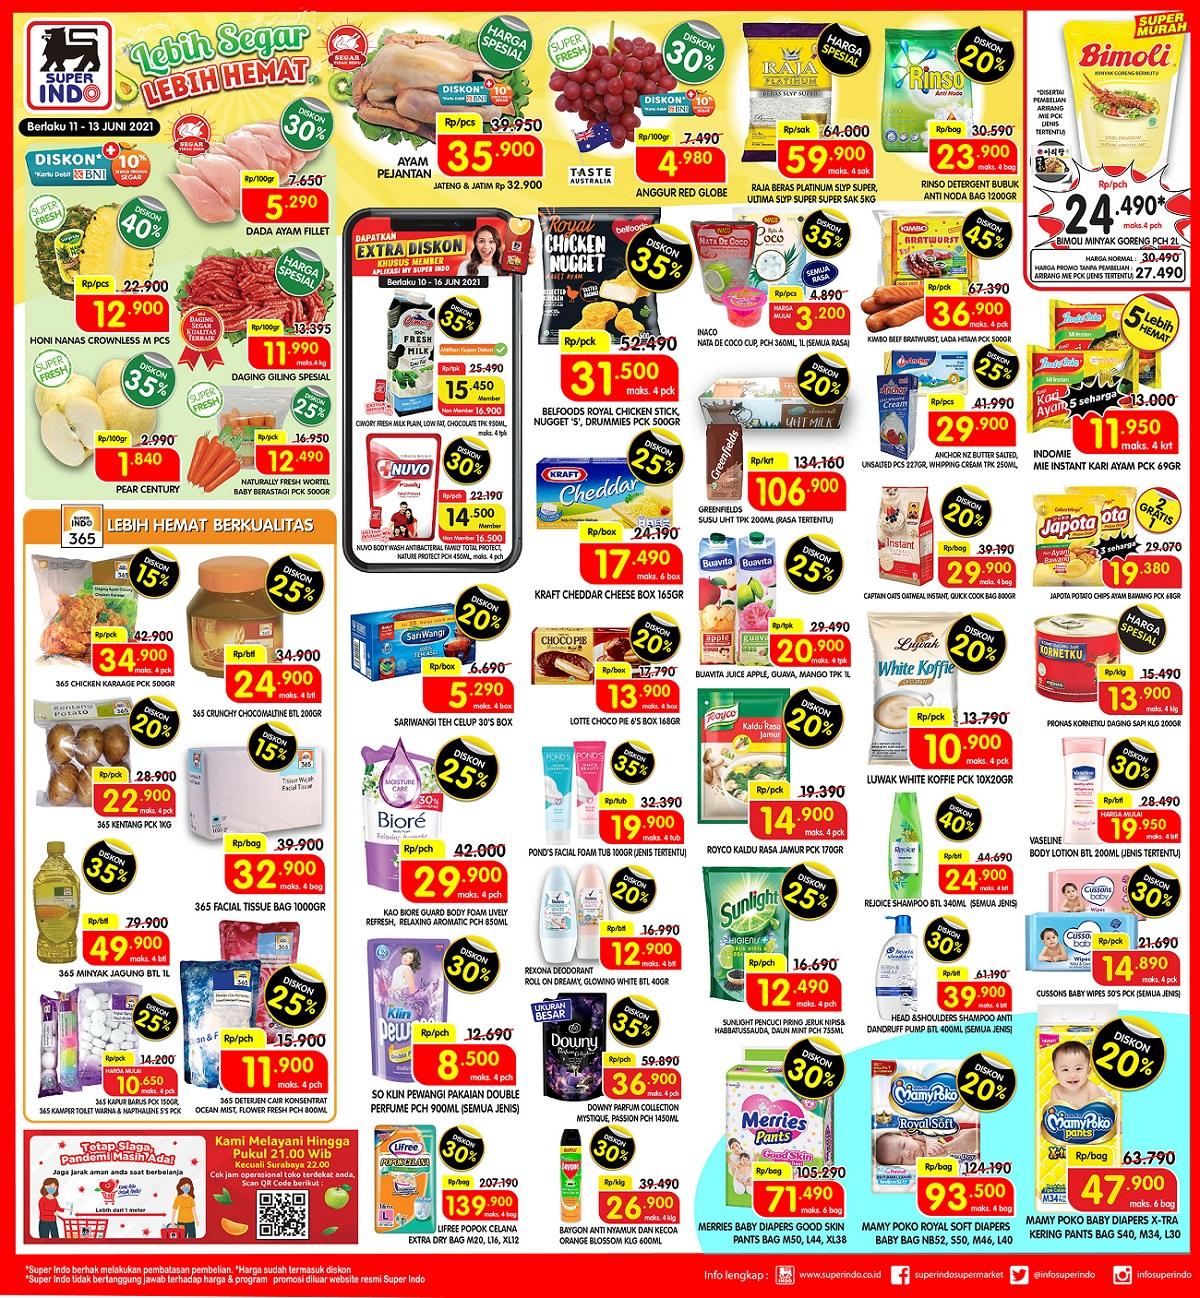 Katalog Promo JSM Superindo 11-13 Juni 2021